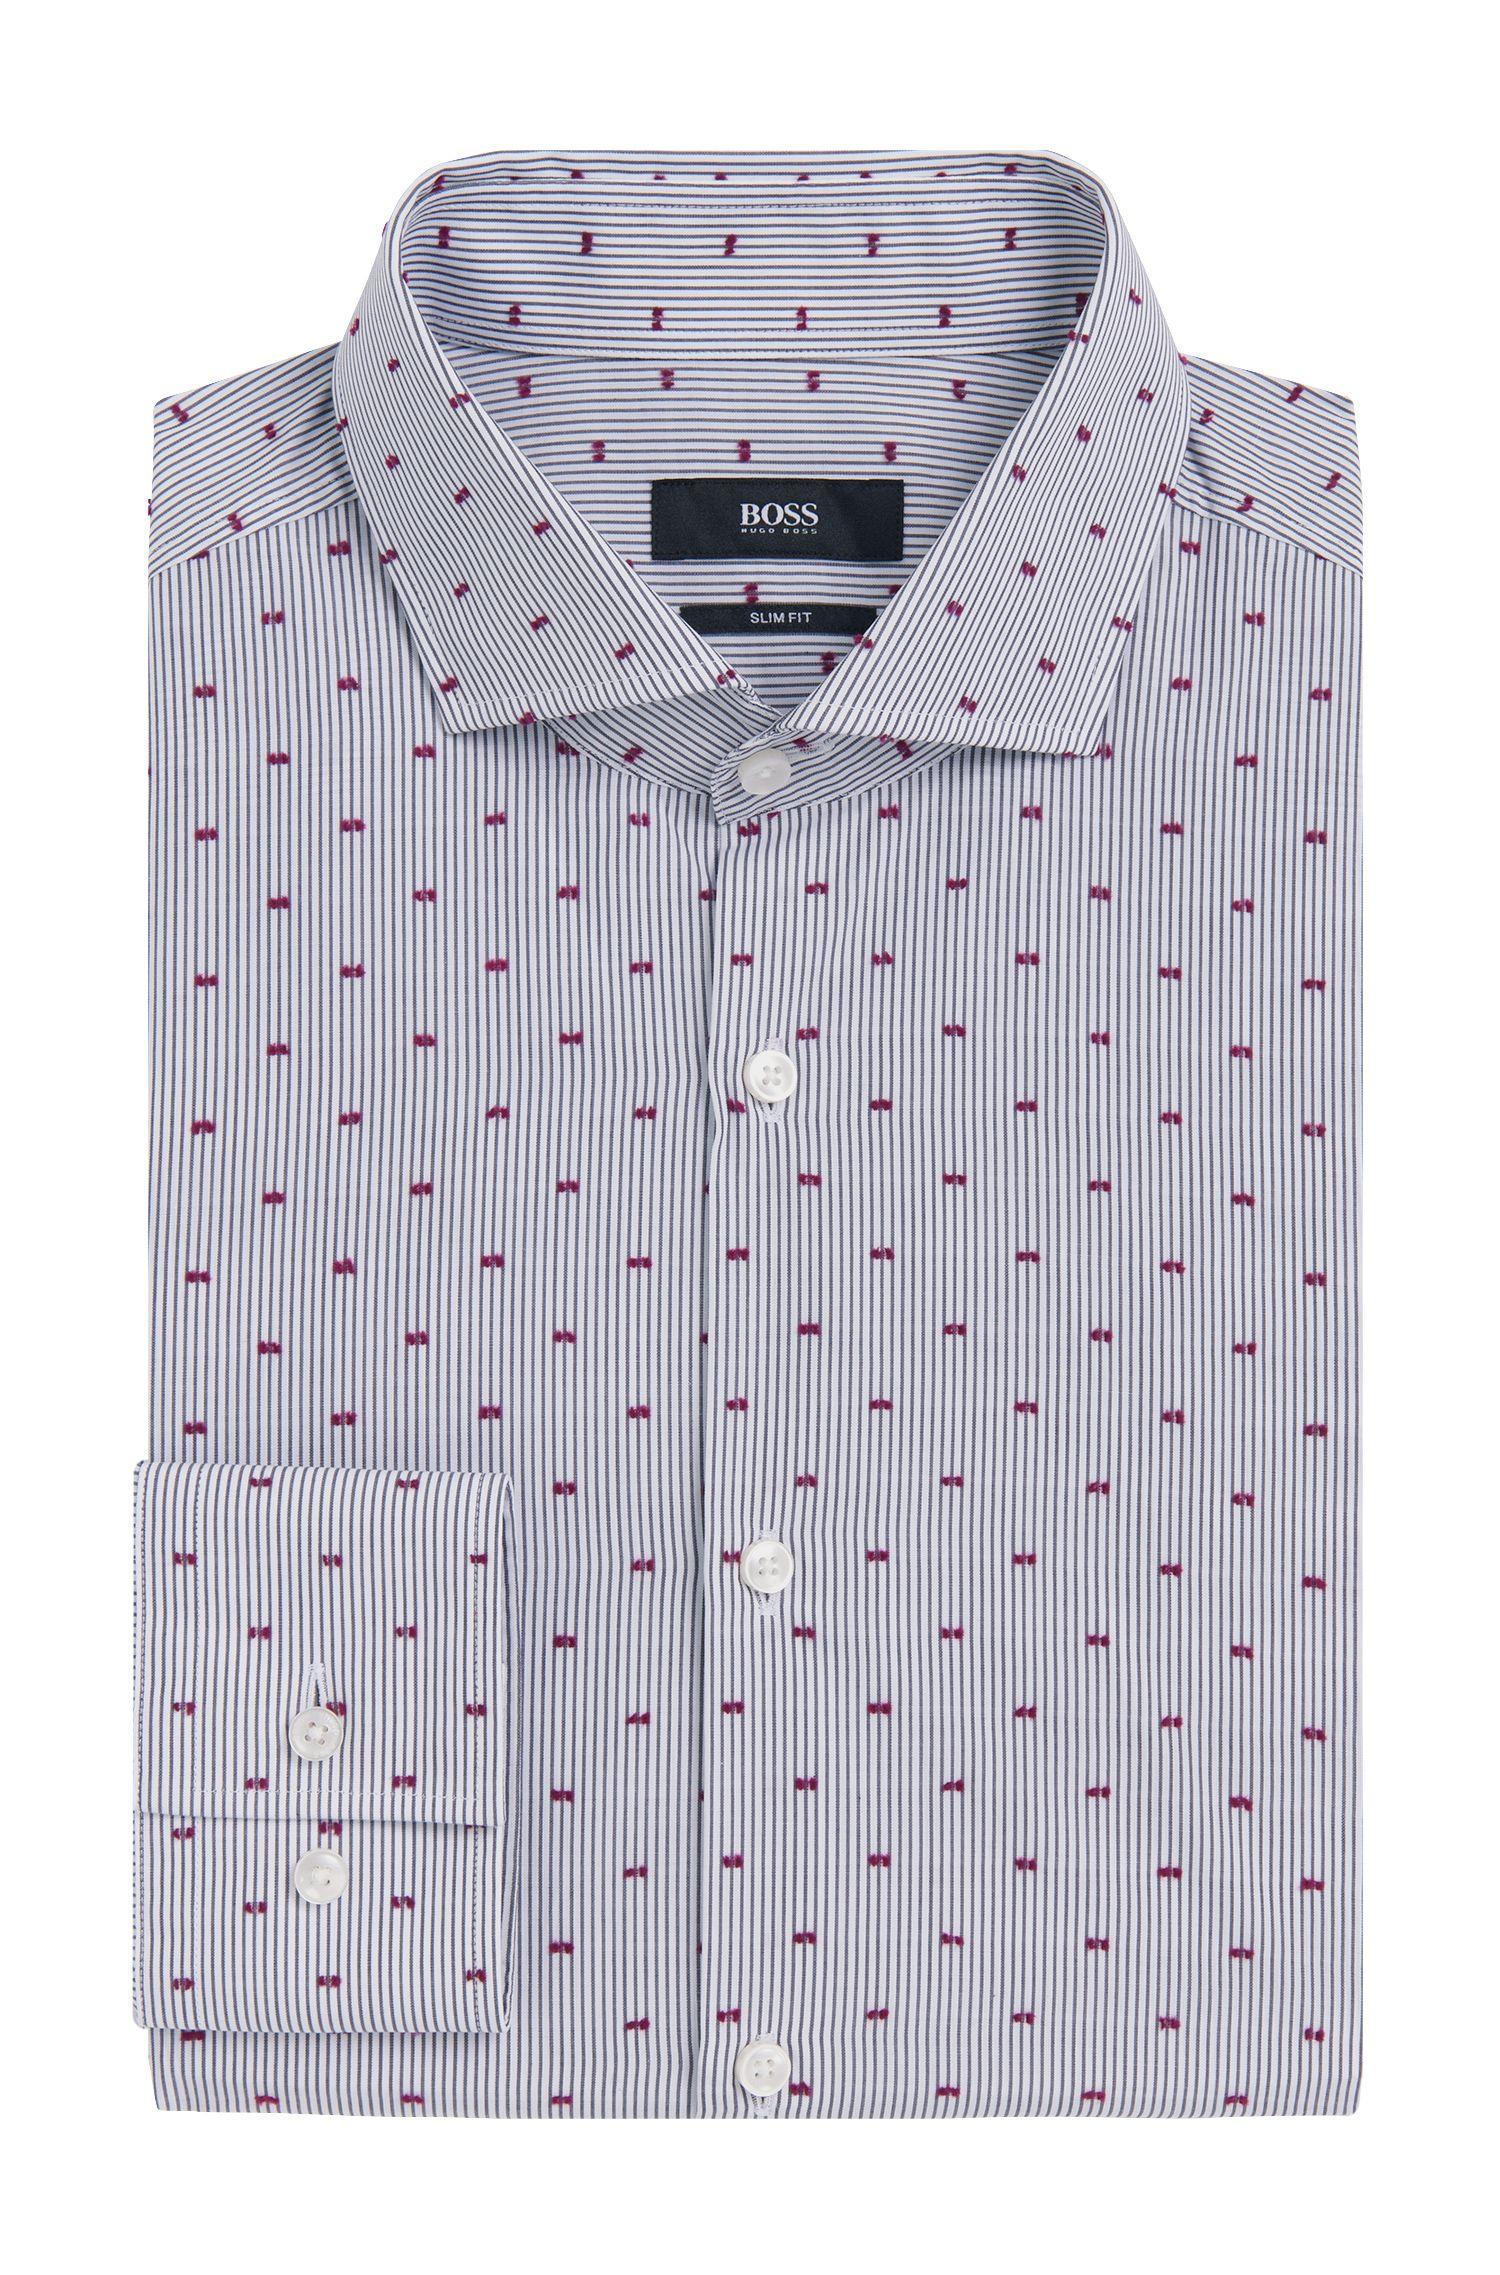 'Jason' | Slim Fit, Cotton Fil Coupe Dress Shirt